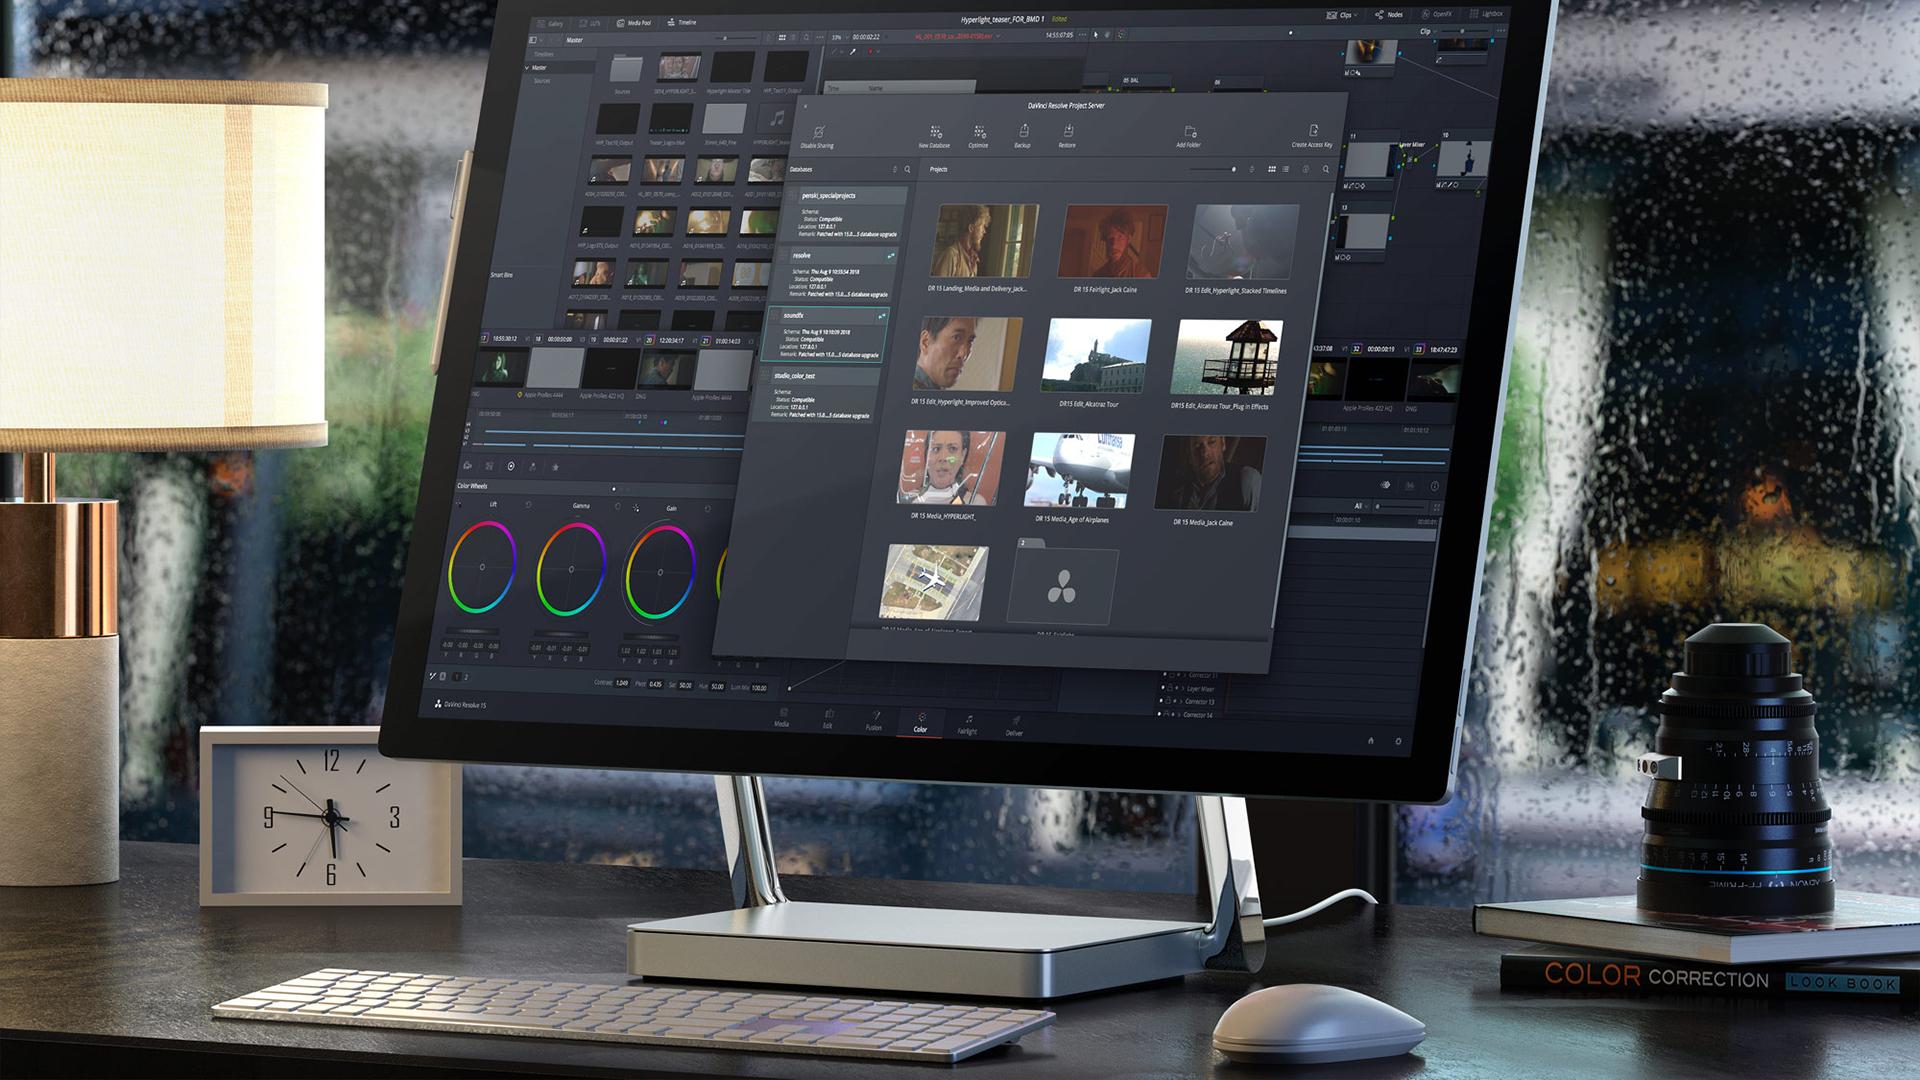 Blackmagic Design DaVinci Resolve 16.1 Final Version is Available to Download Now   cinema5D